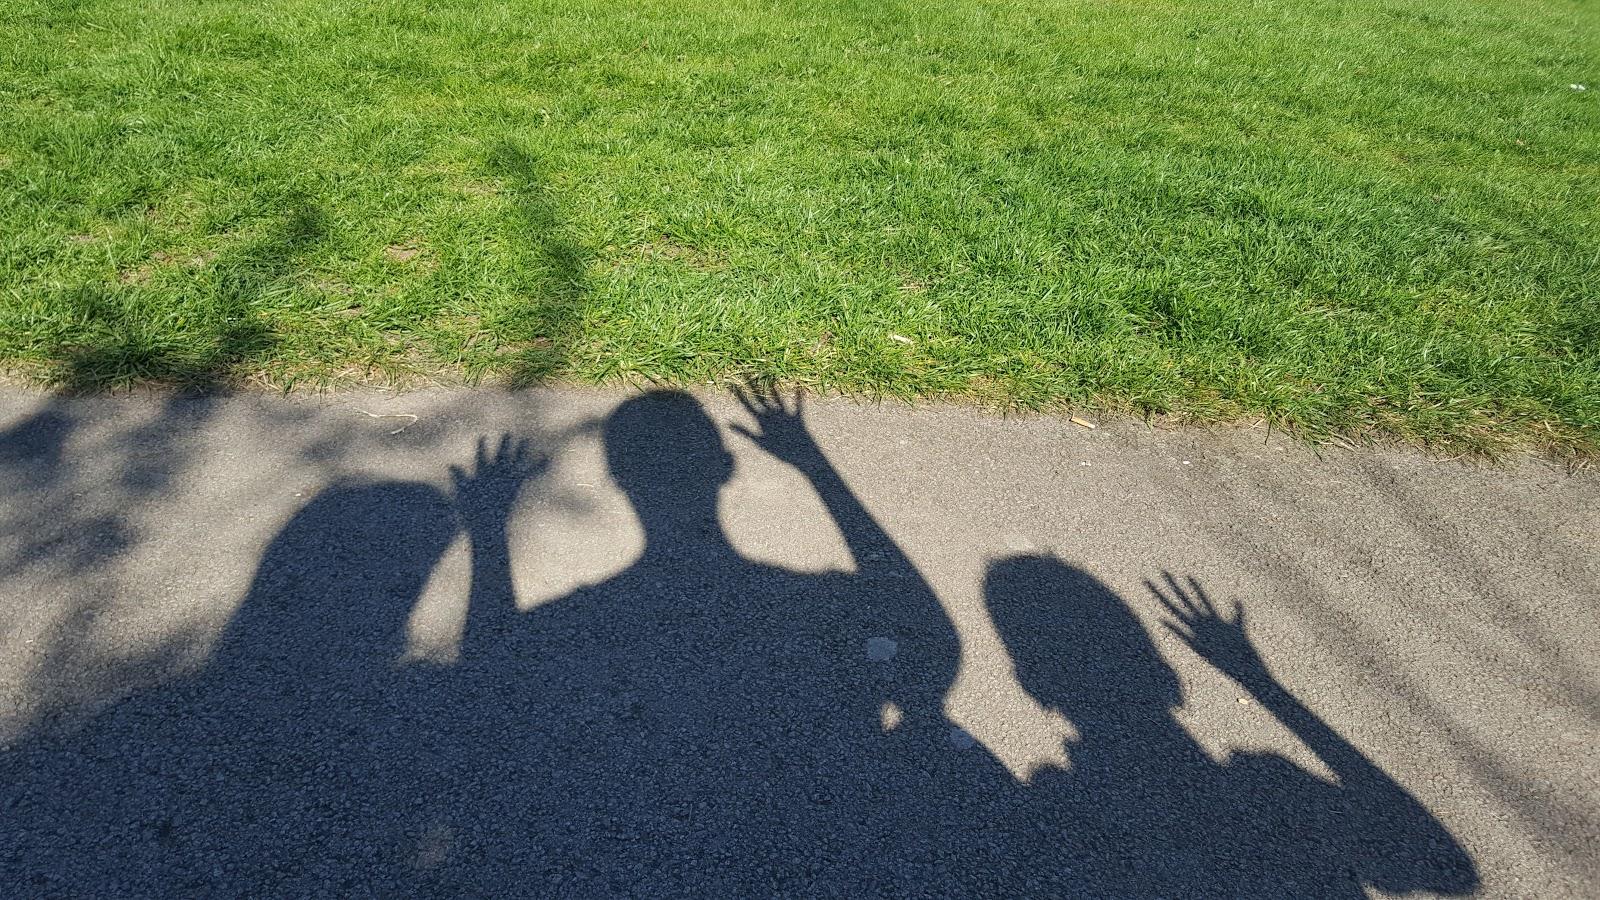 Family Shadows